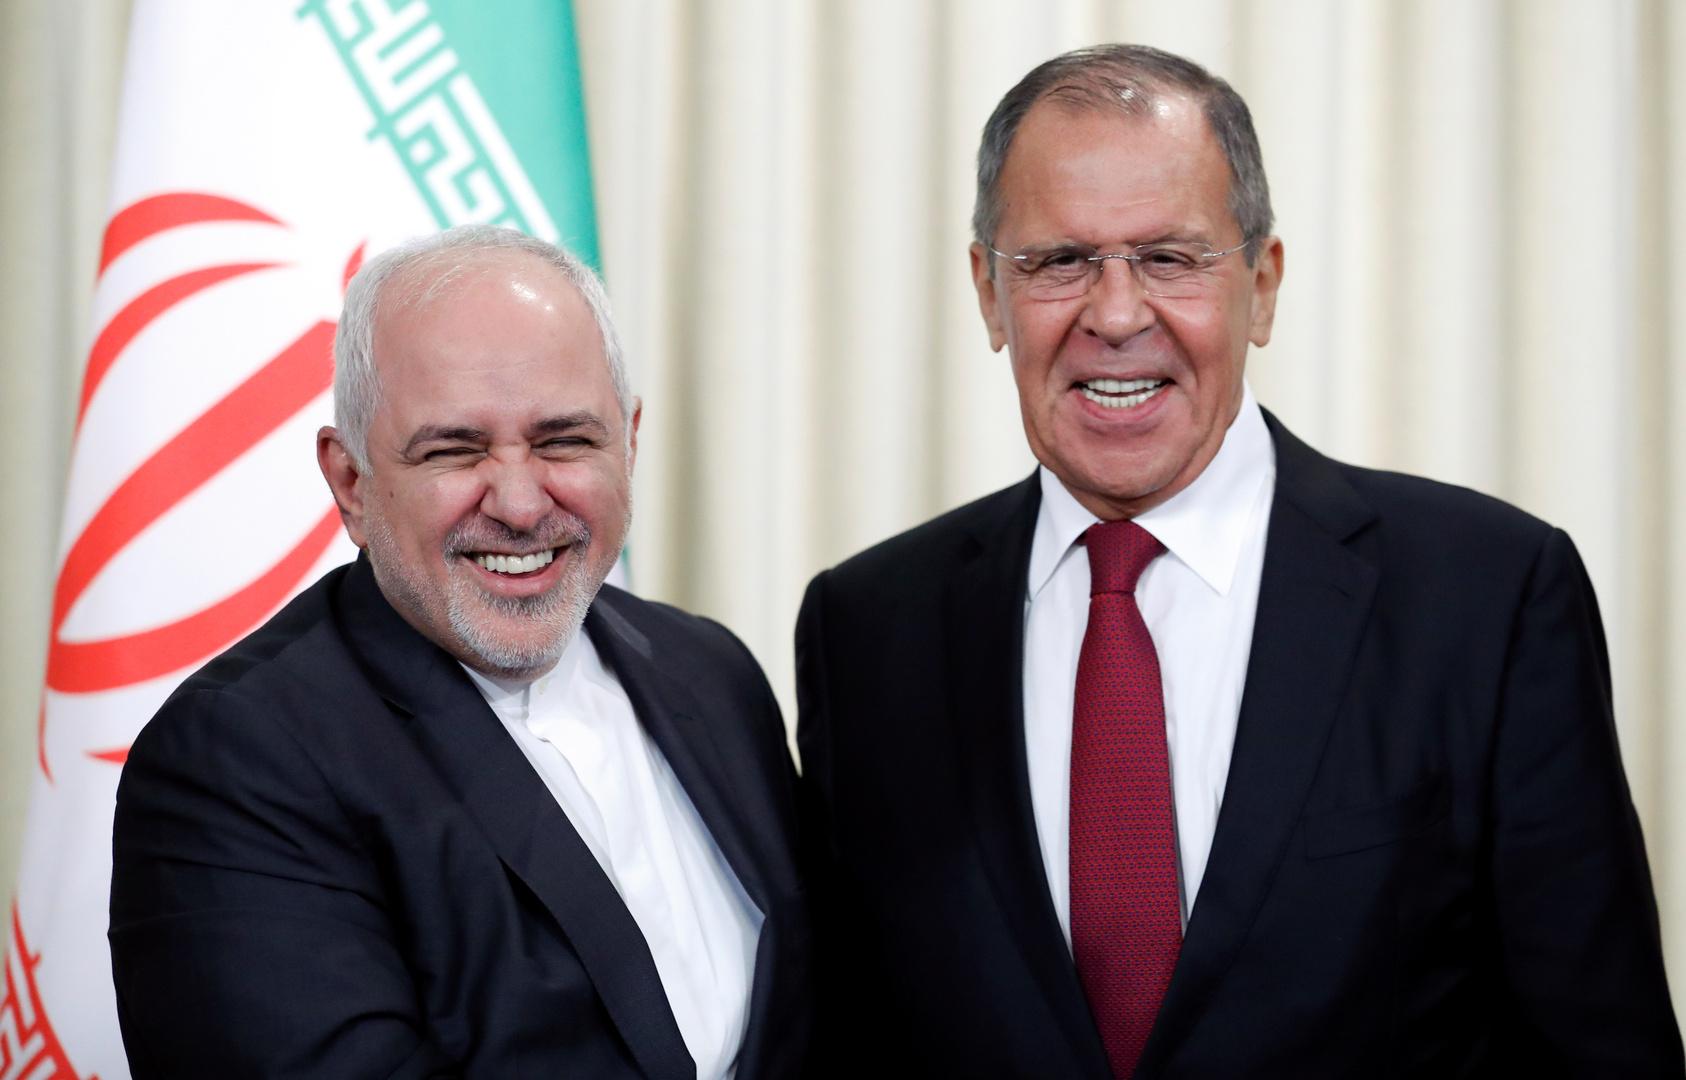 سيرغي لافروف ومحمد جواد ظريف